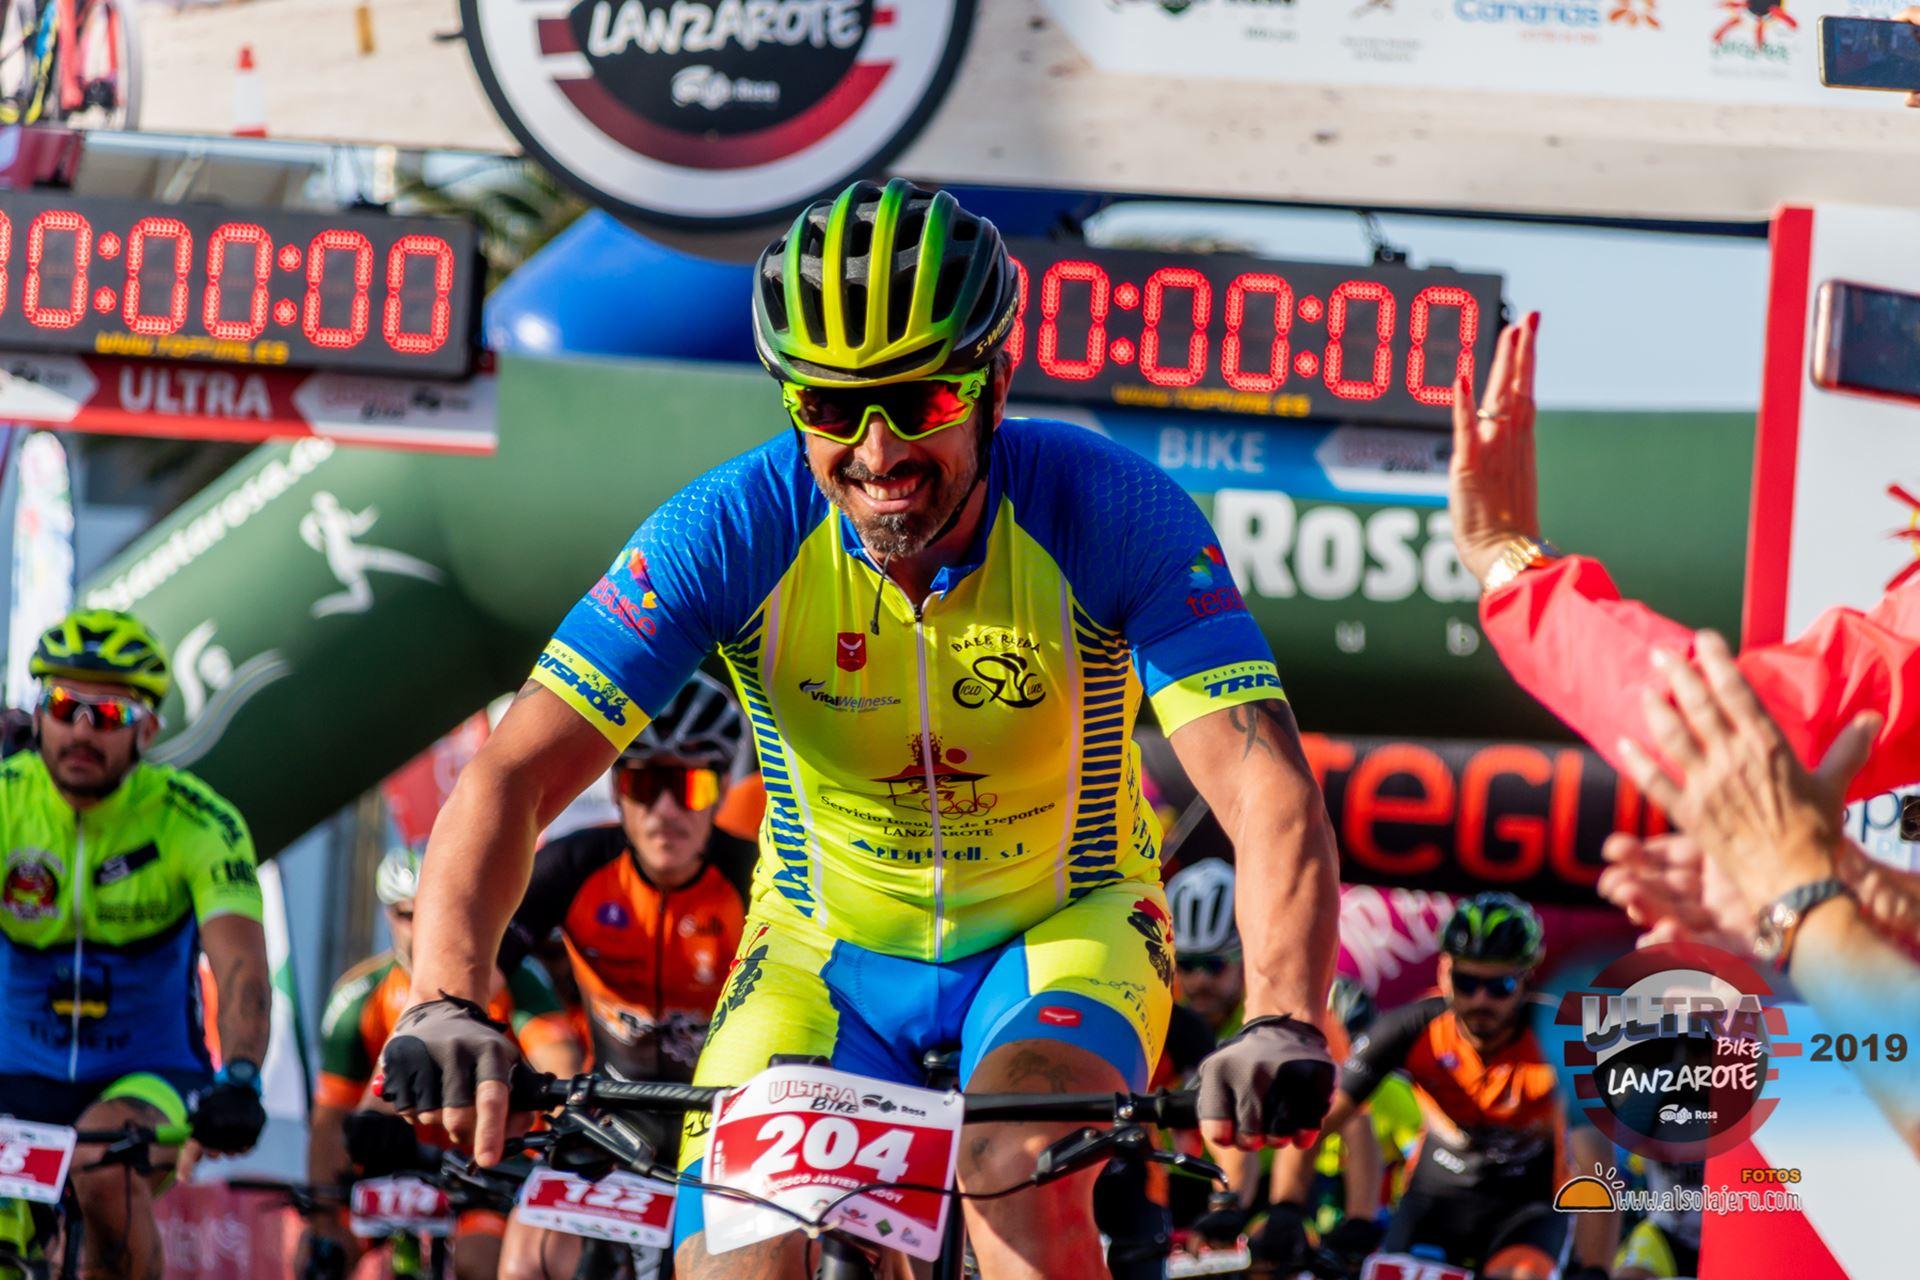 Salida 2ª Etapa Ultrabike 2019 Fotos Alsolajero.com-35